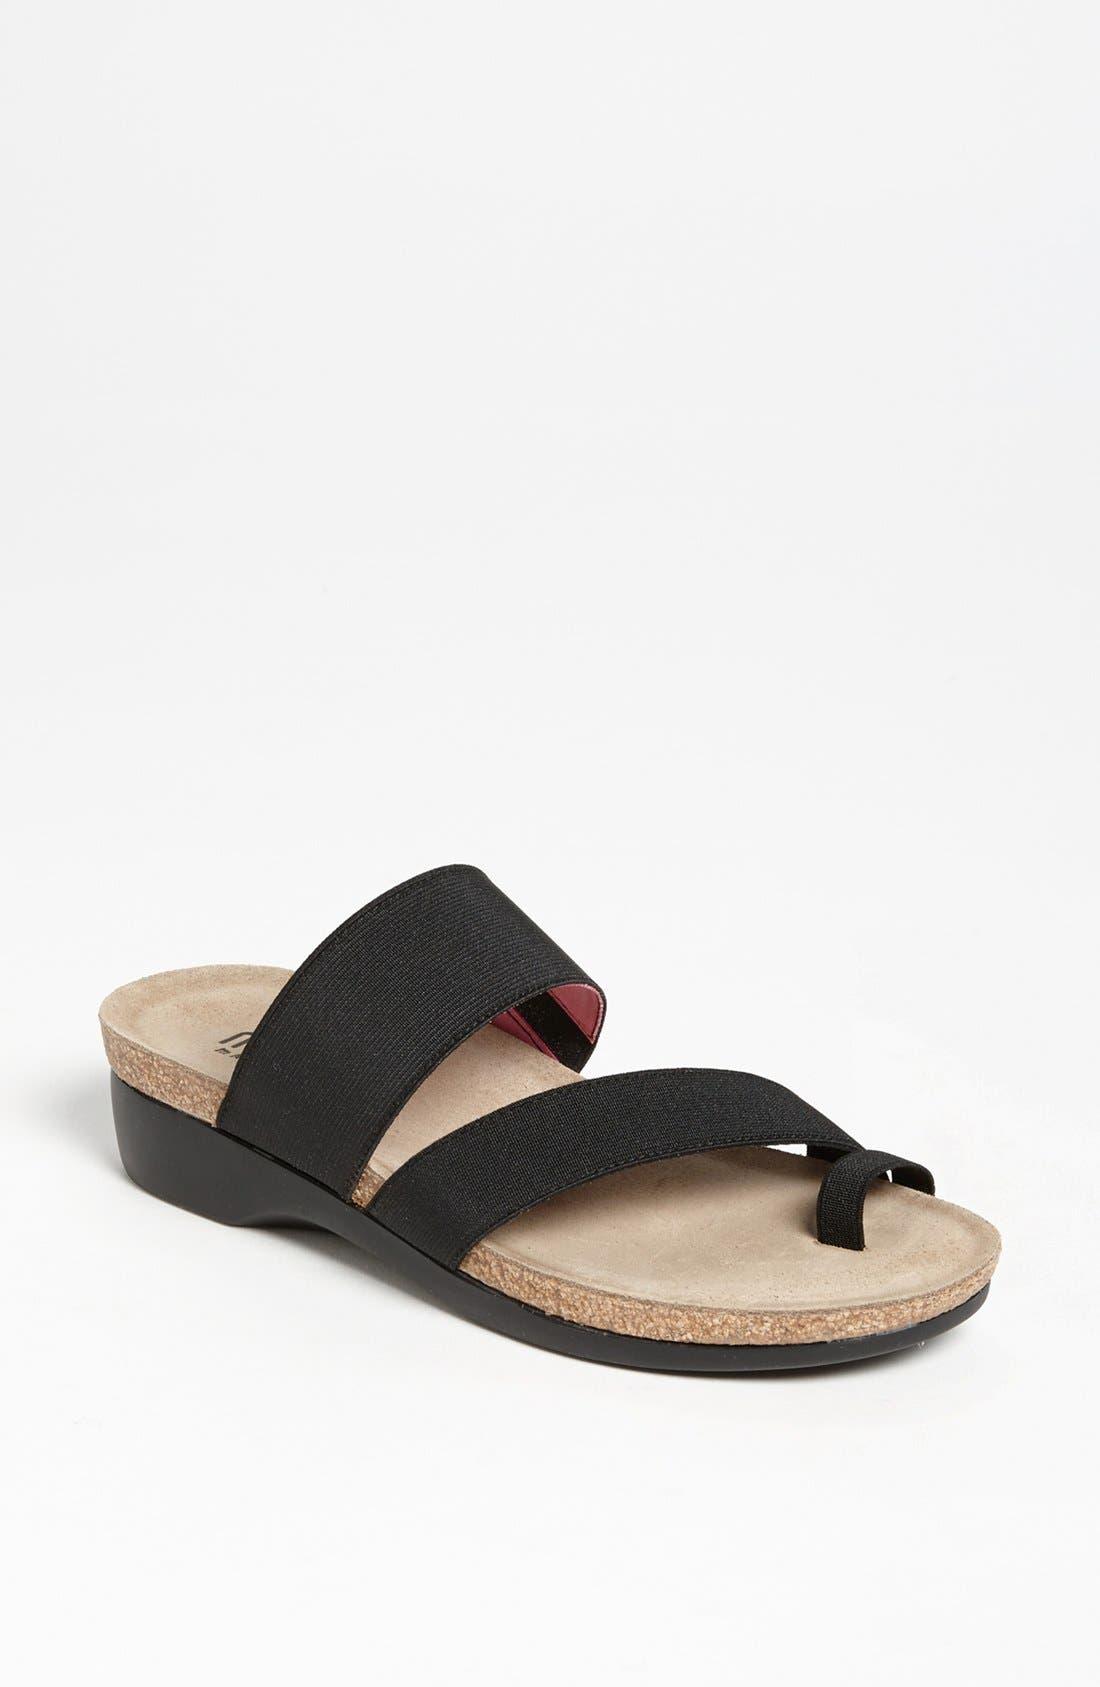 MUNRO Aries Sandal